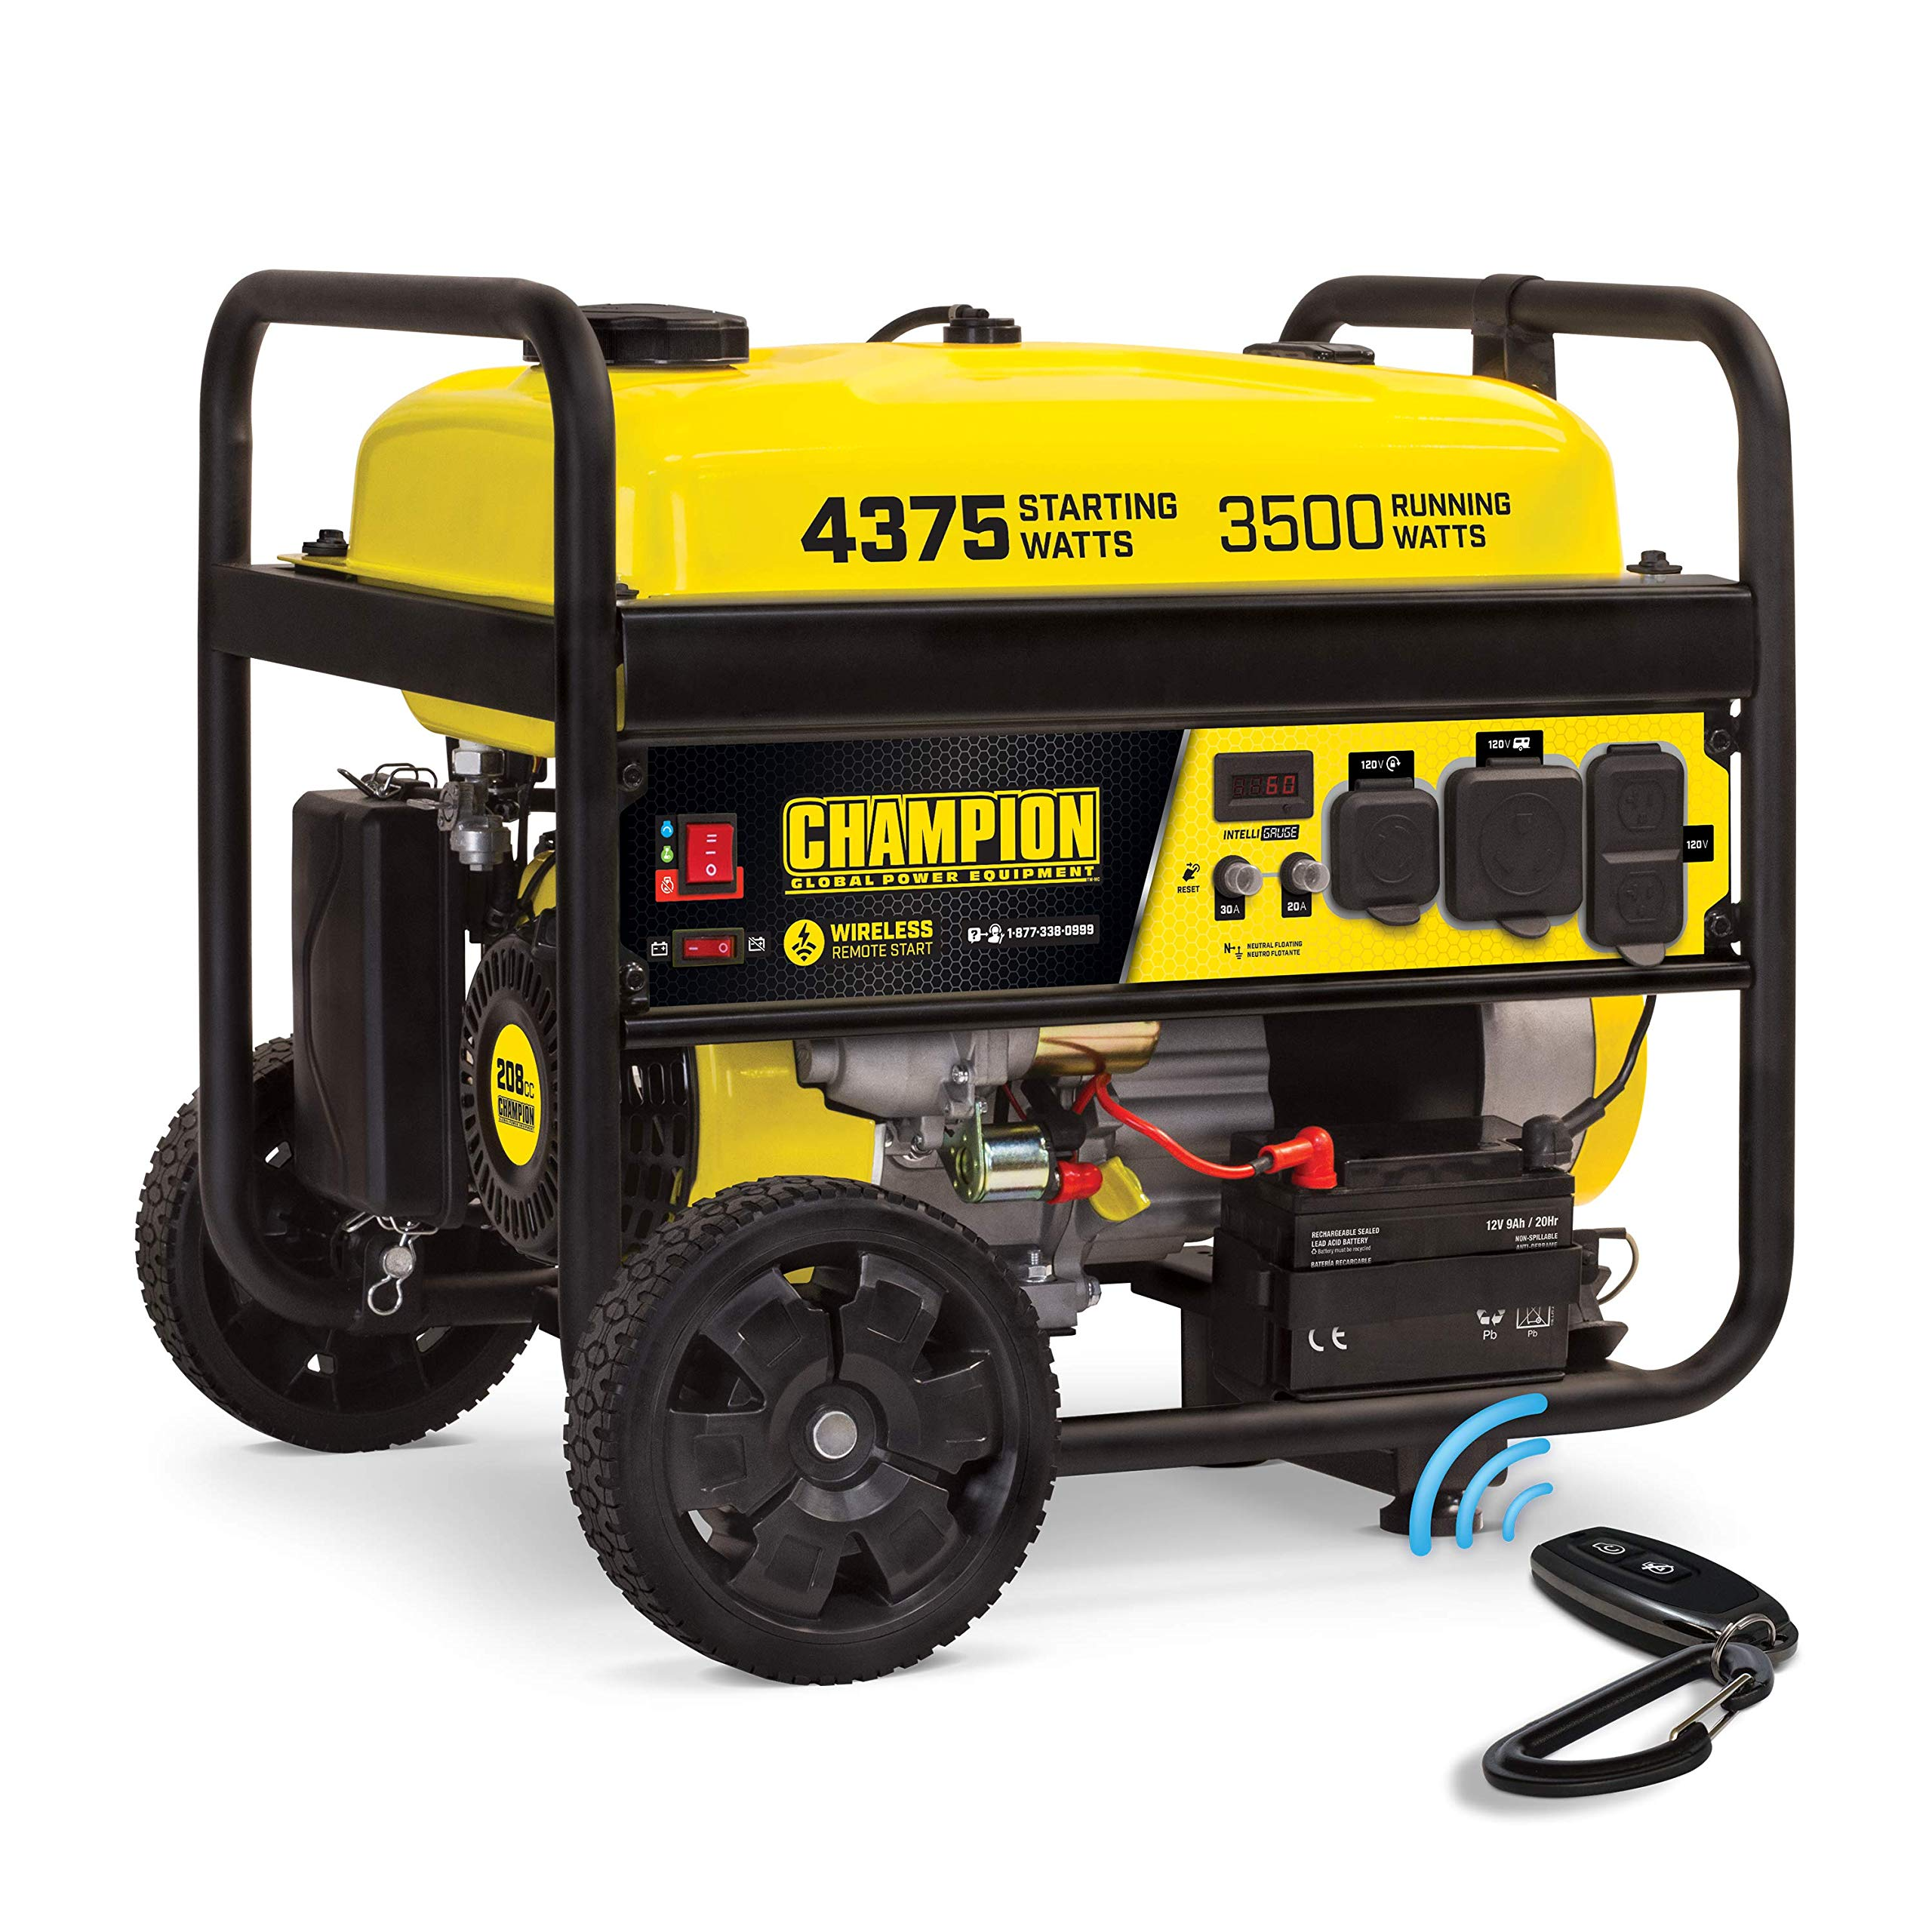 Champion Power Equipment 100554 RV Ready Wireless Remote Start Portable Generator, Black and Yellow